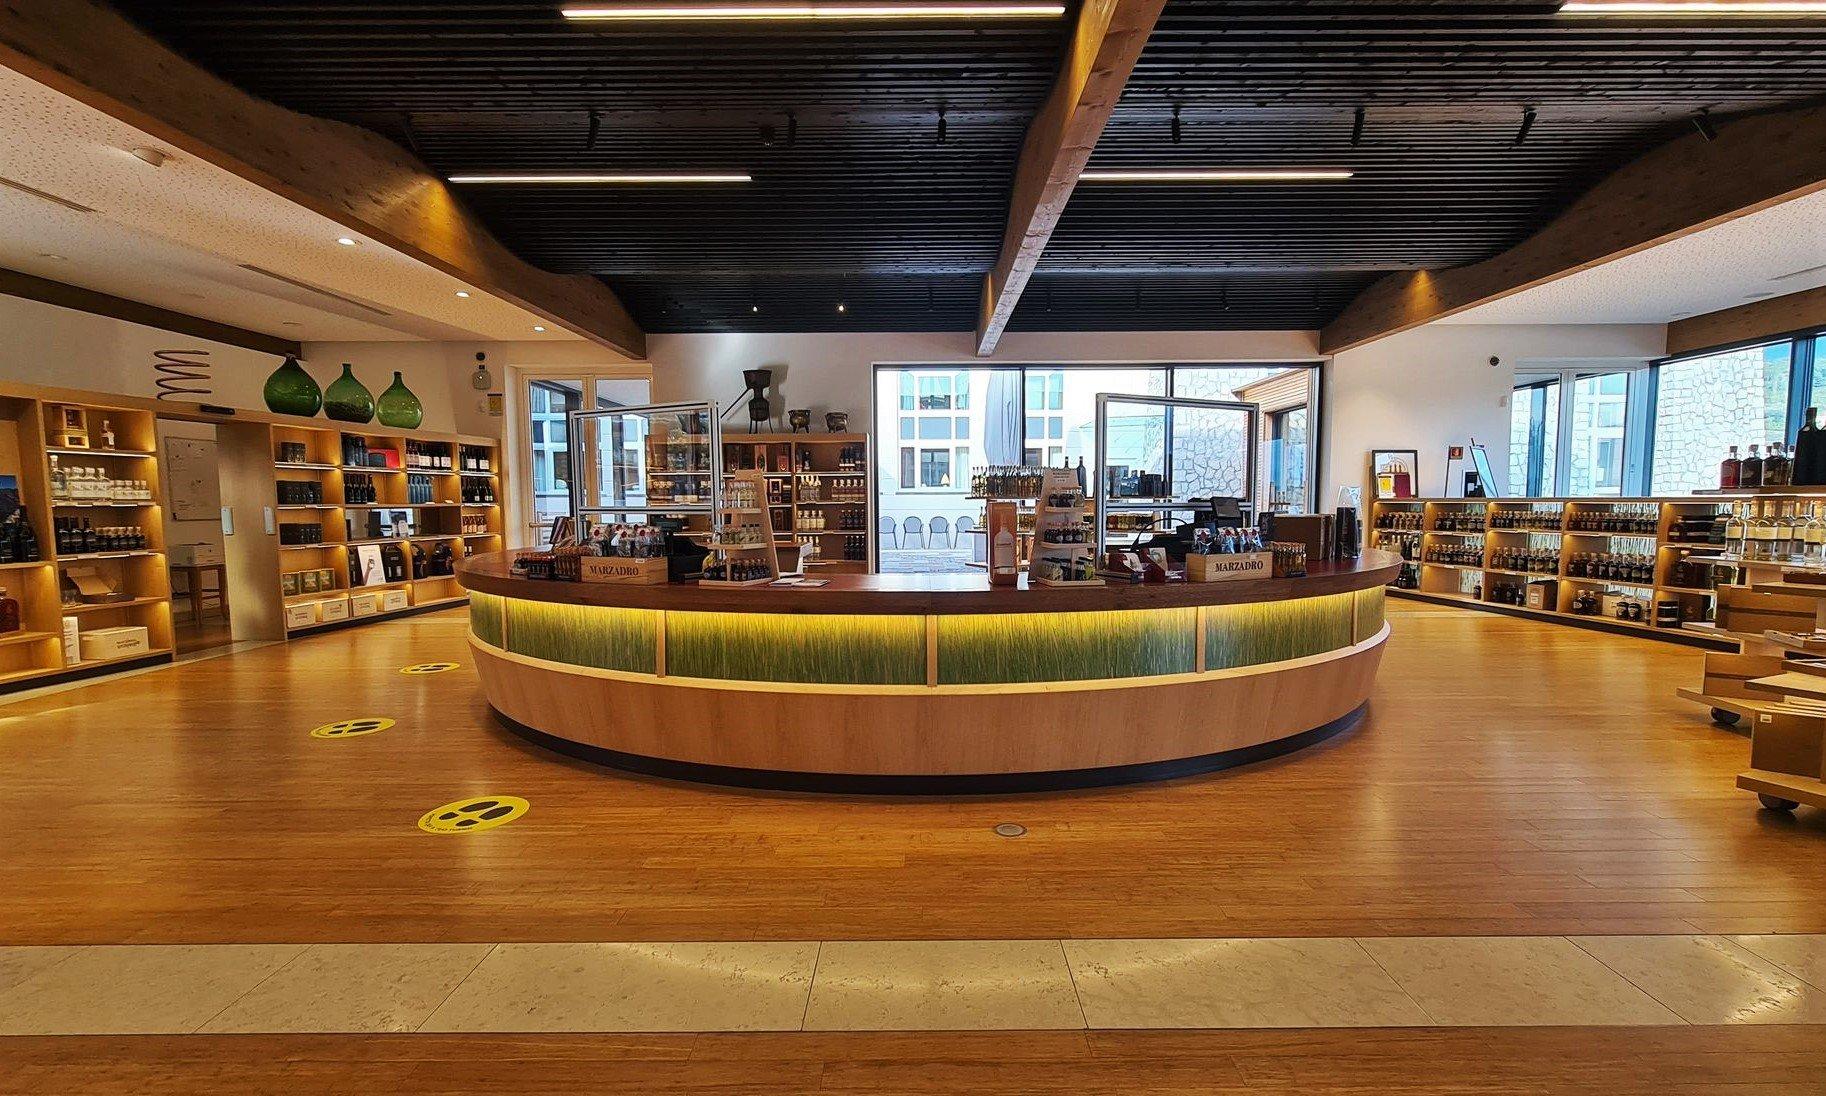 Centro visite e punto vendita distilleria Marzadro